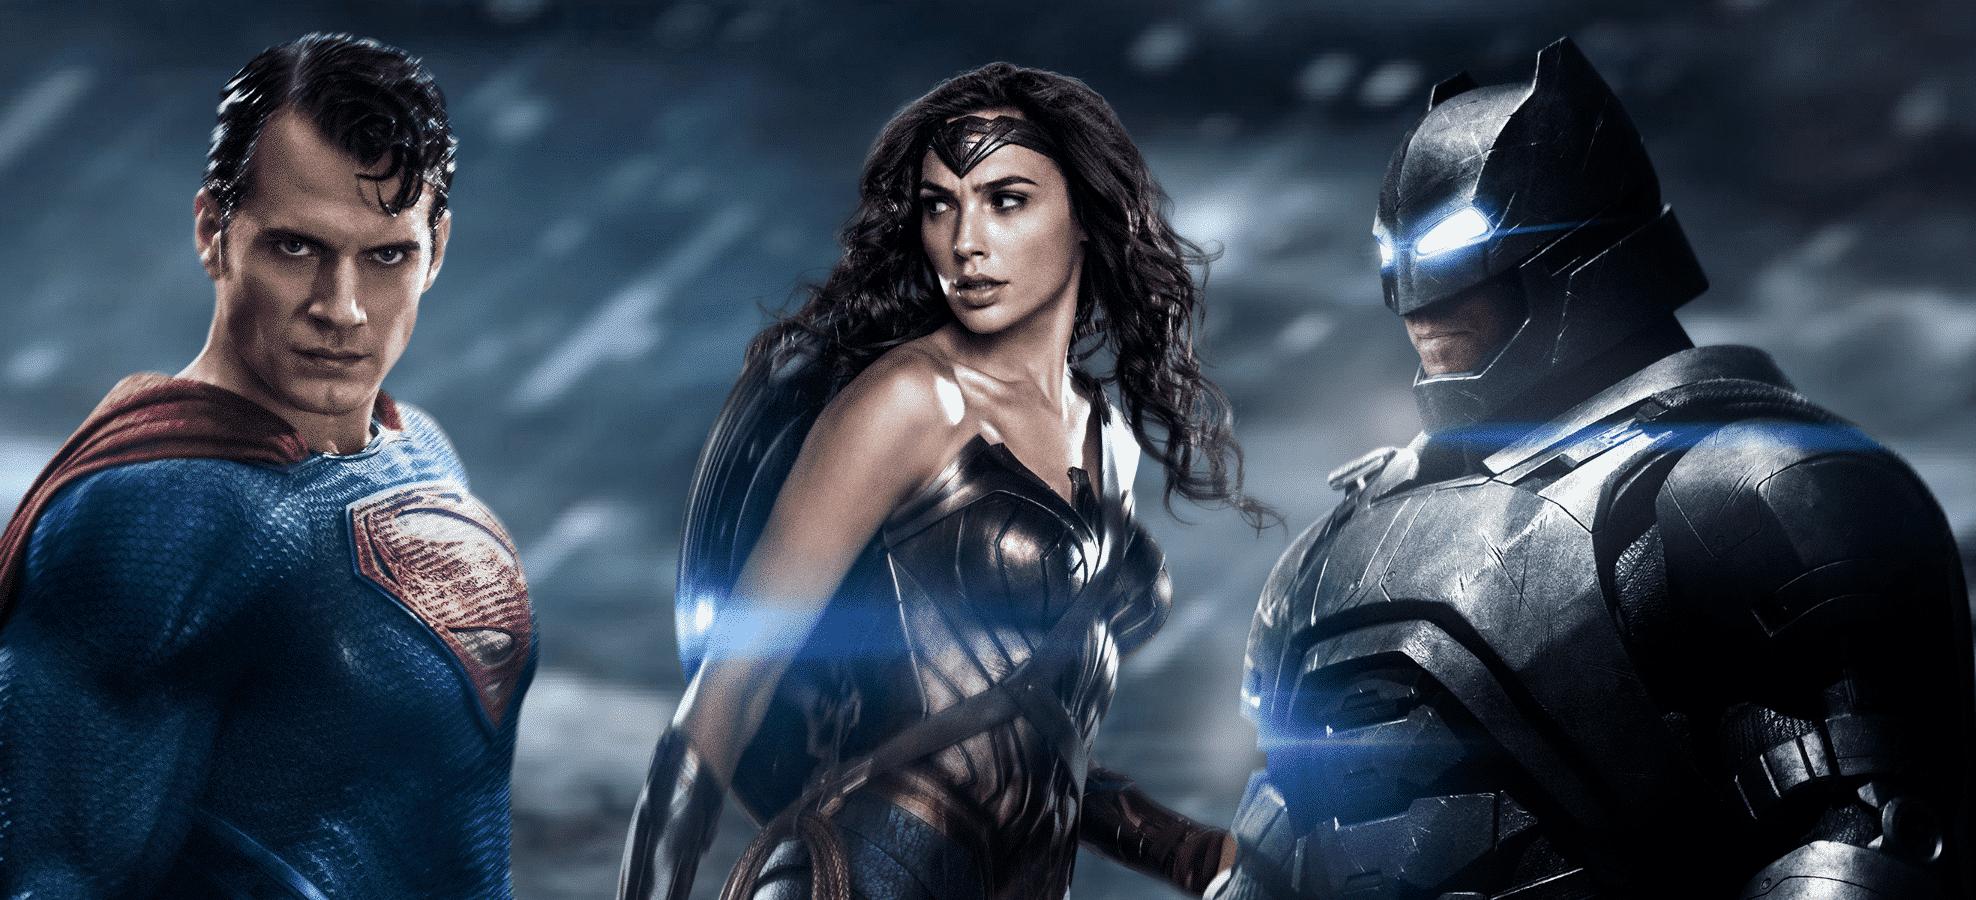 batman_v_superman___dawn_of_justice_wallpaper_by_asthonx1-d9sh0ka